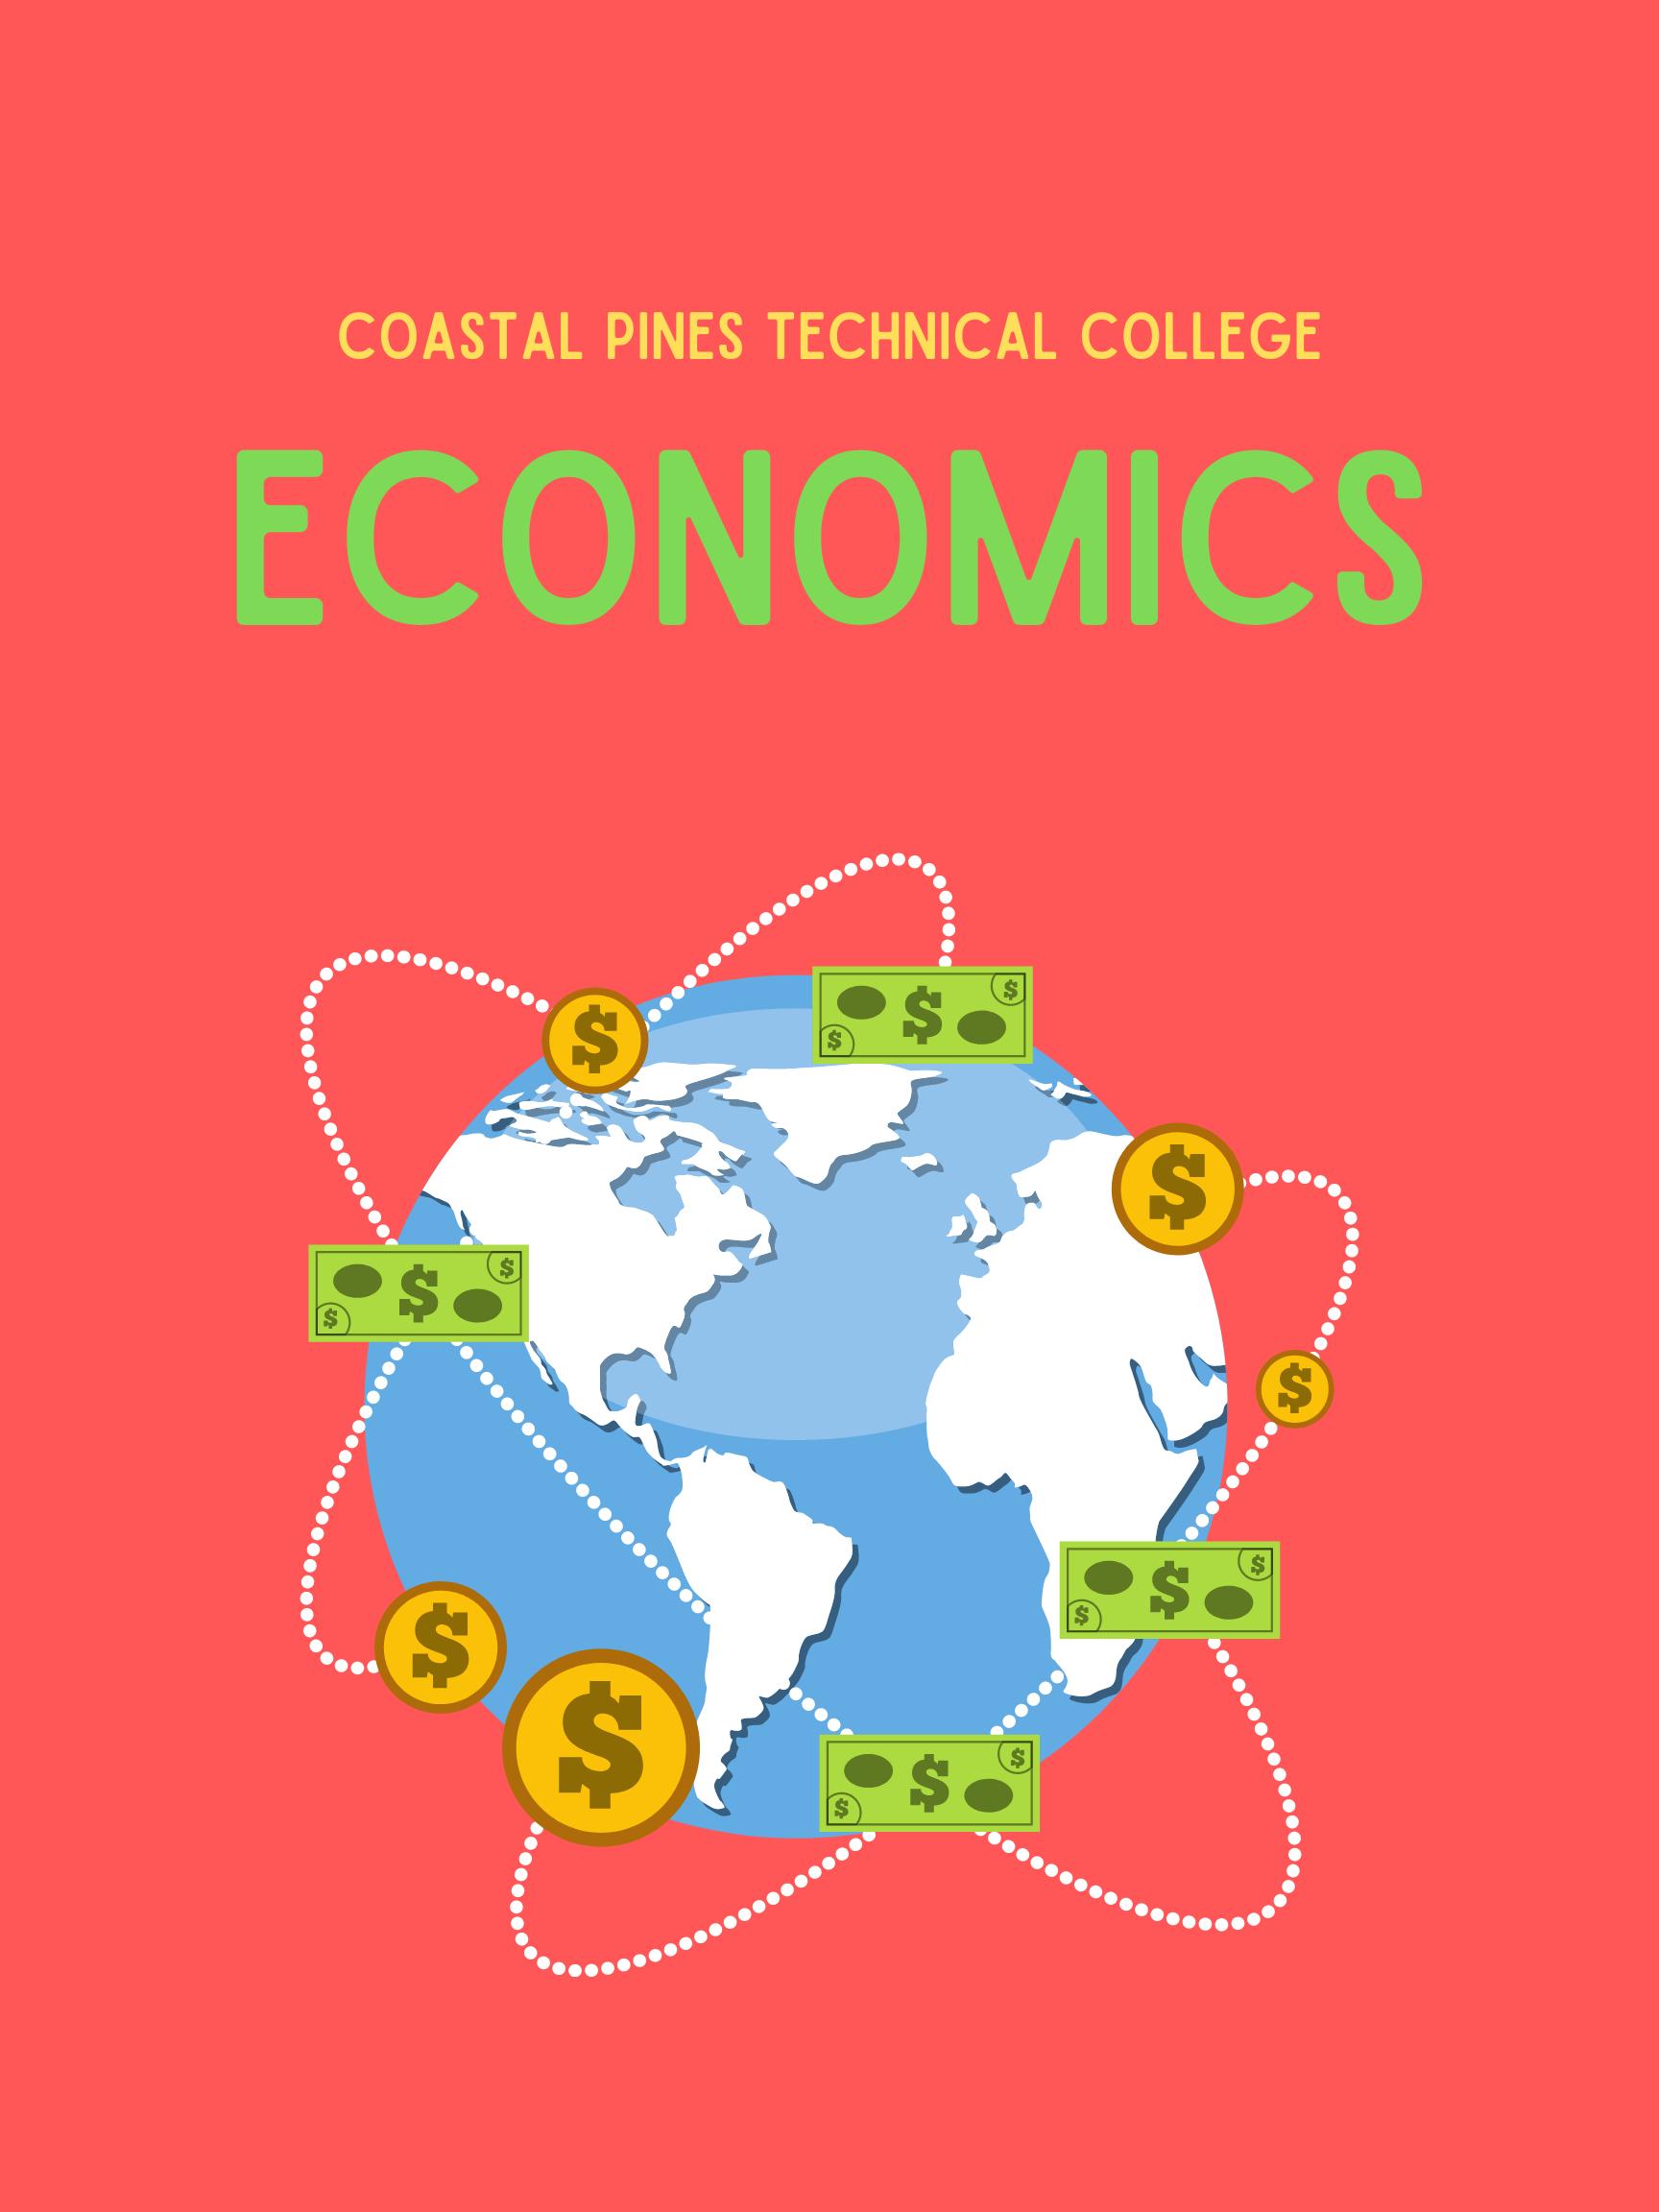 Coastal Pines Technical College Economics